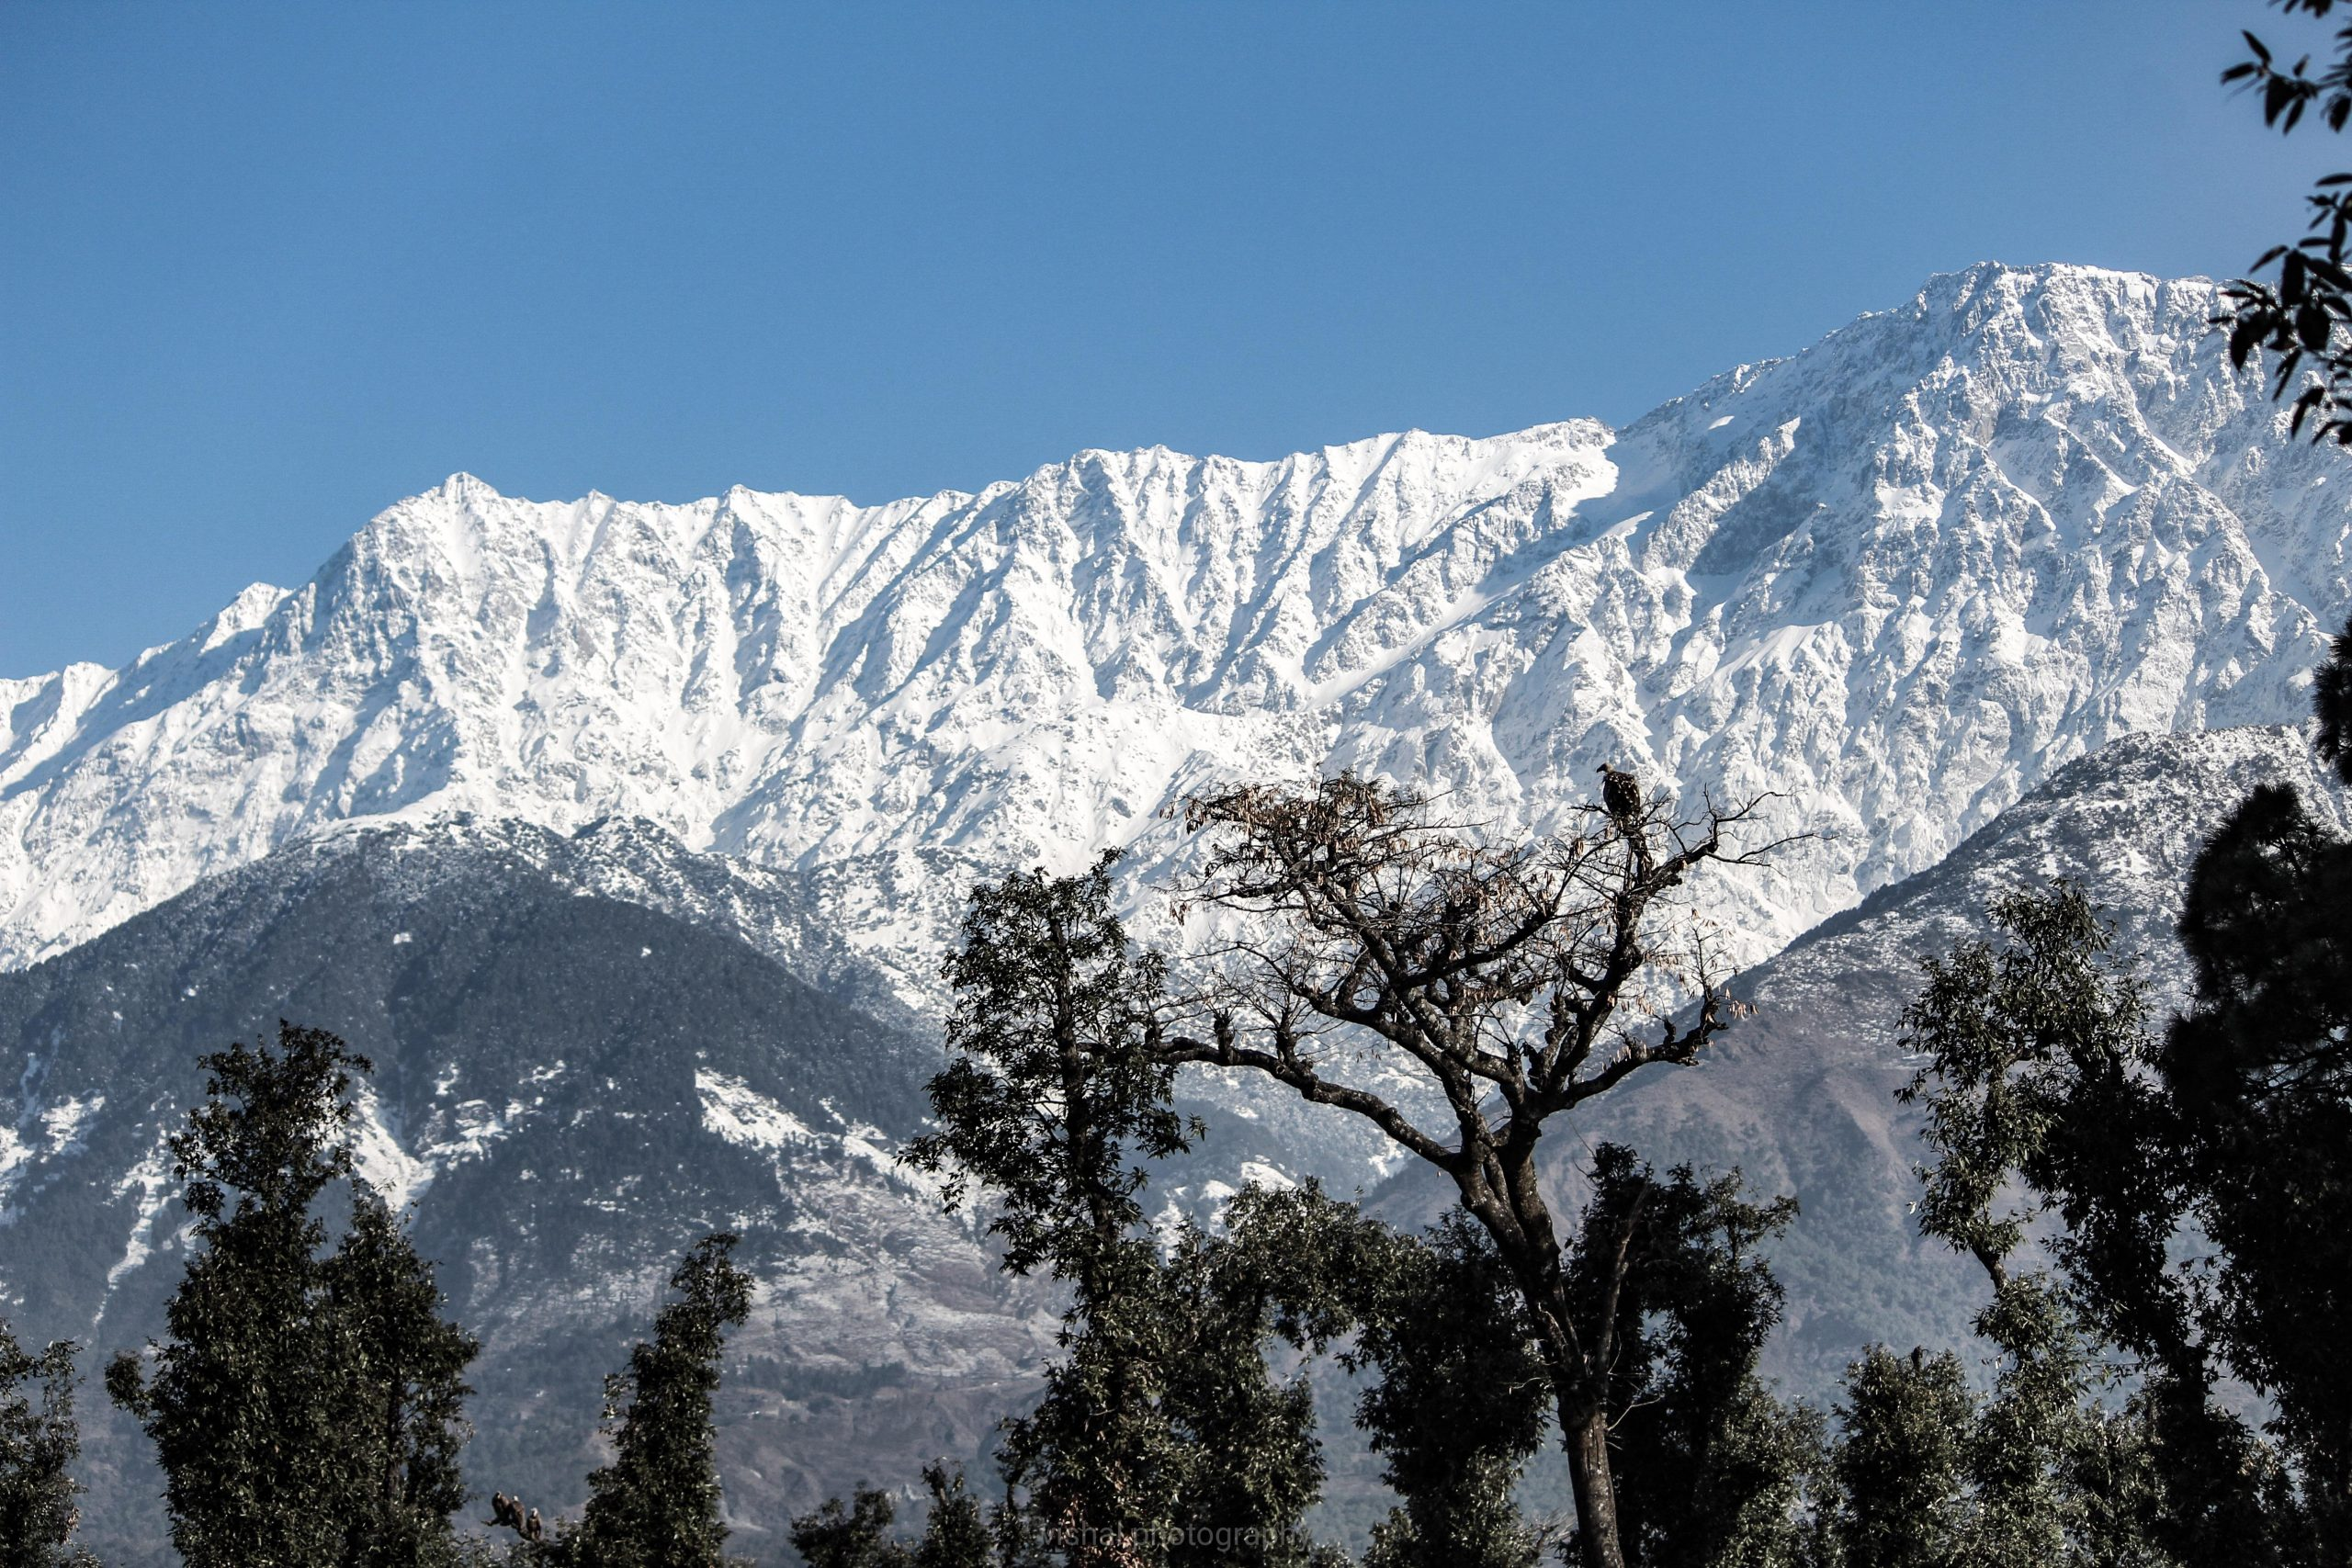 Snowy Dhauladhar mountain range Dharamshala